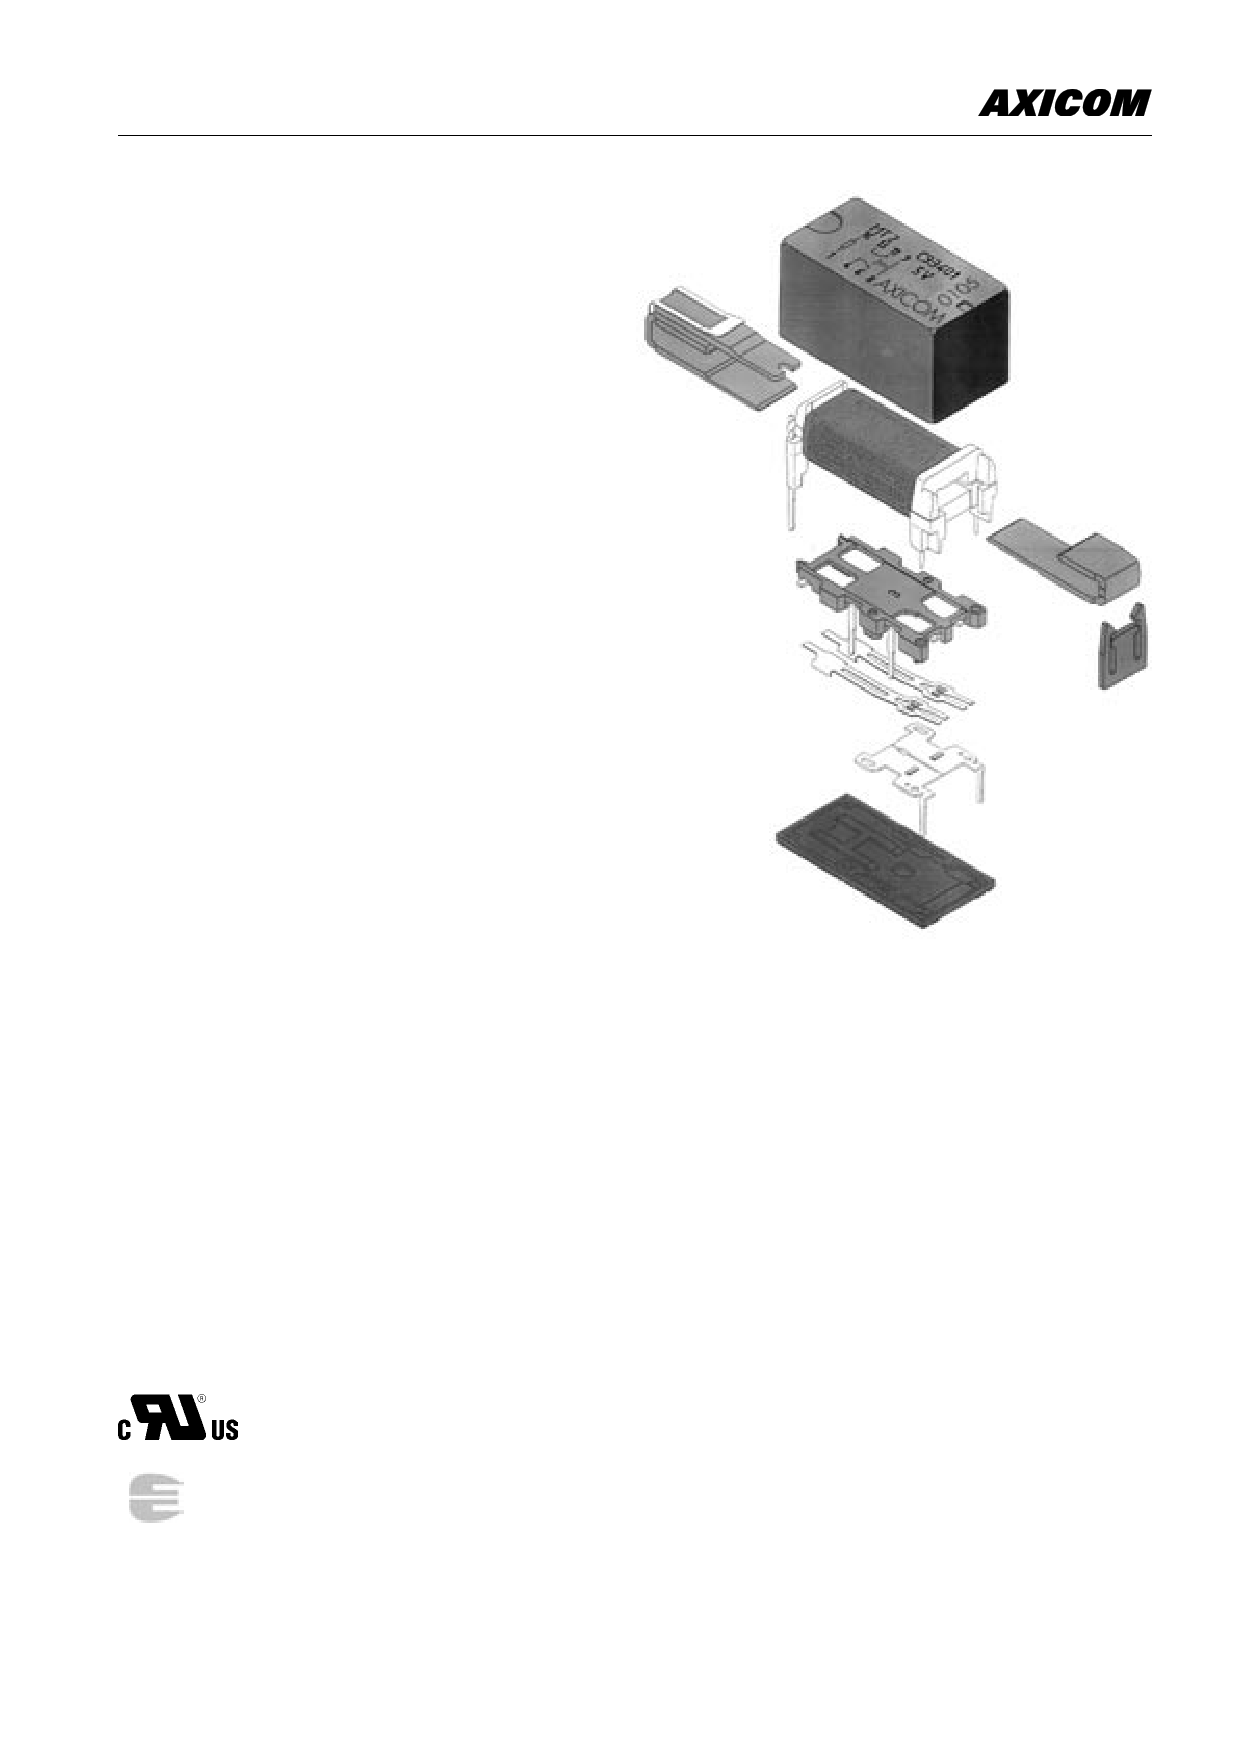 7-1462000-7 Даташит, Описание, Даташиты